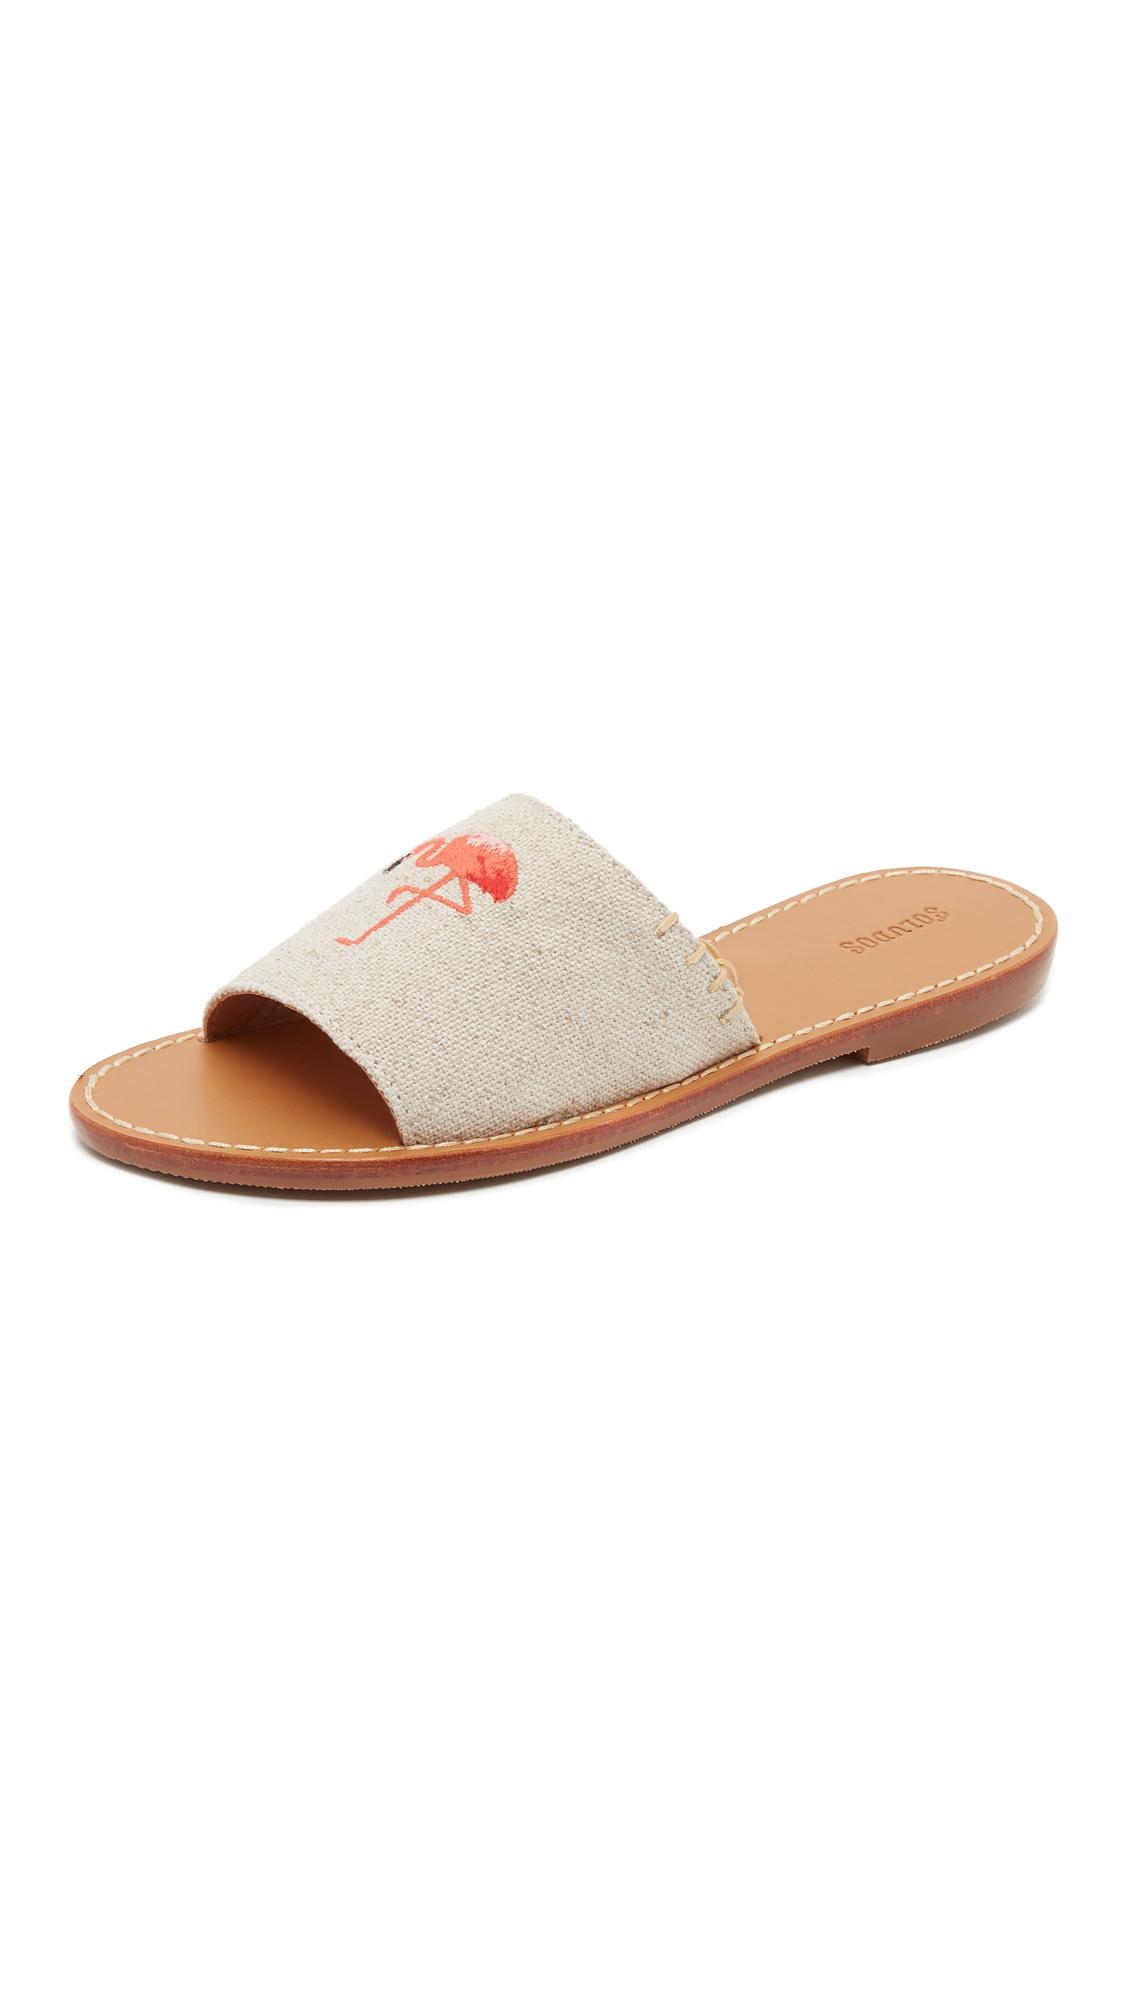 Lyst Soludos Flamingo Slide Sandals In Natural